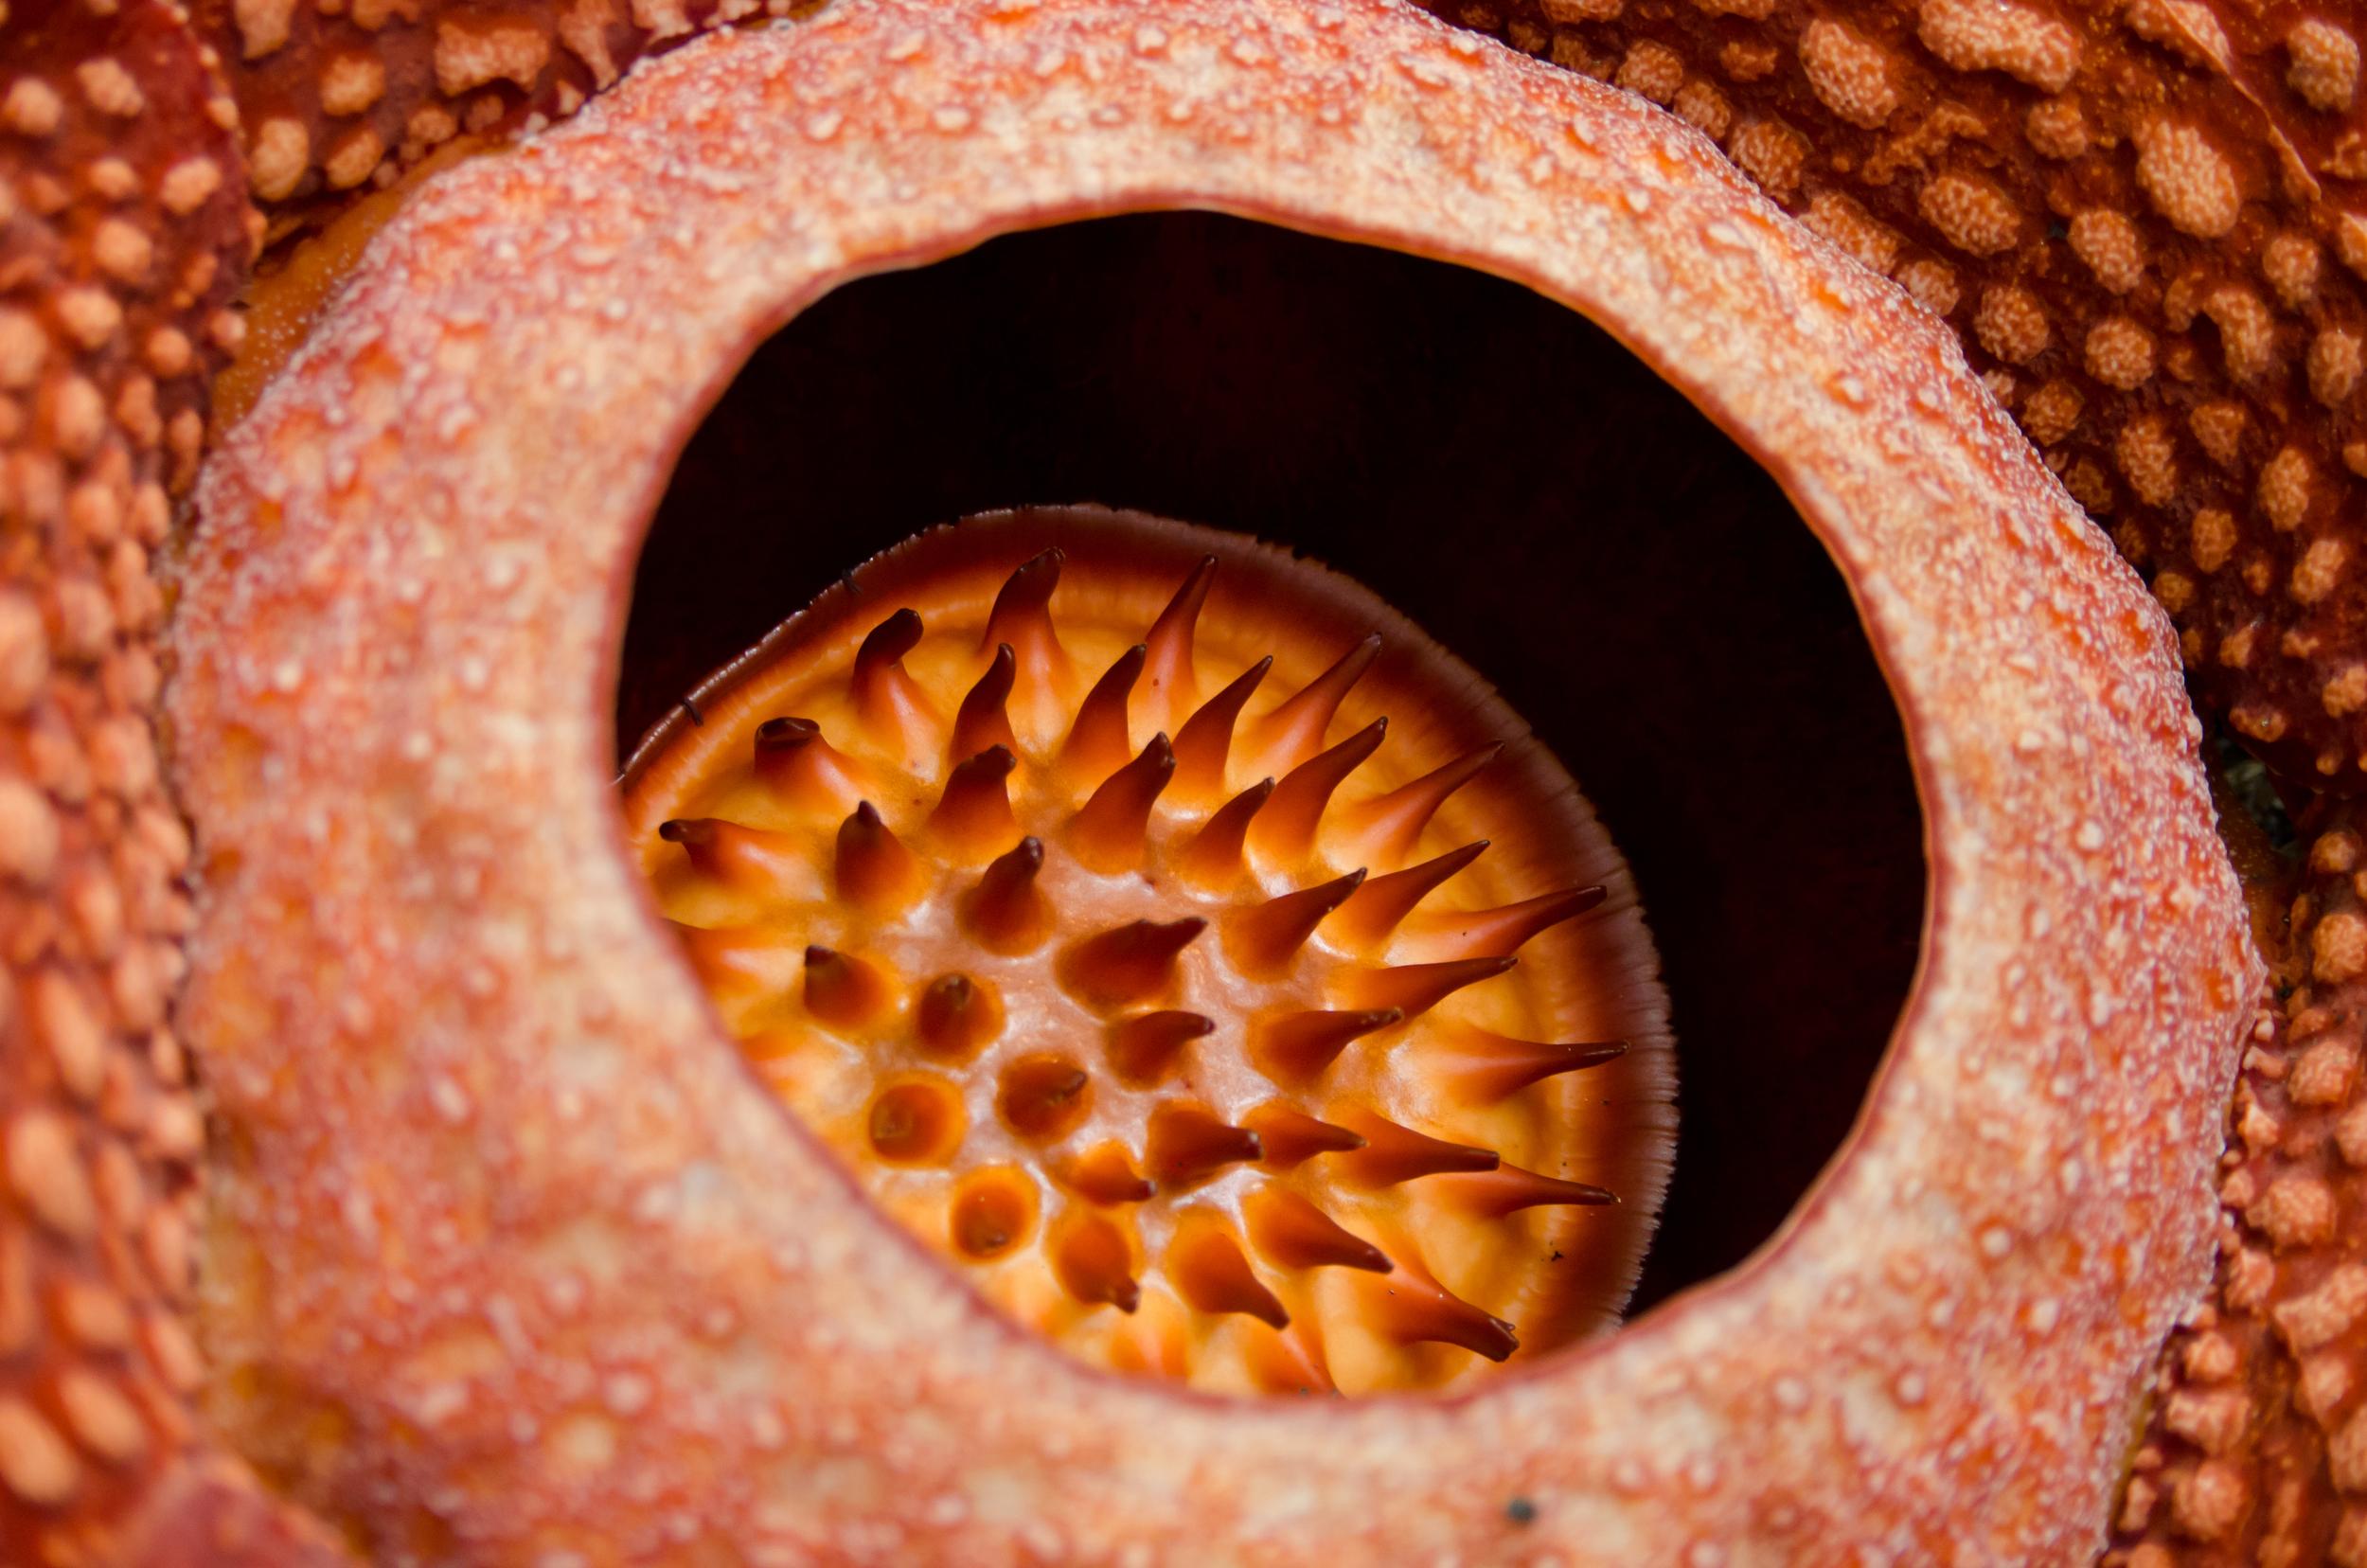 rafflesia-close-up.jpg